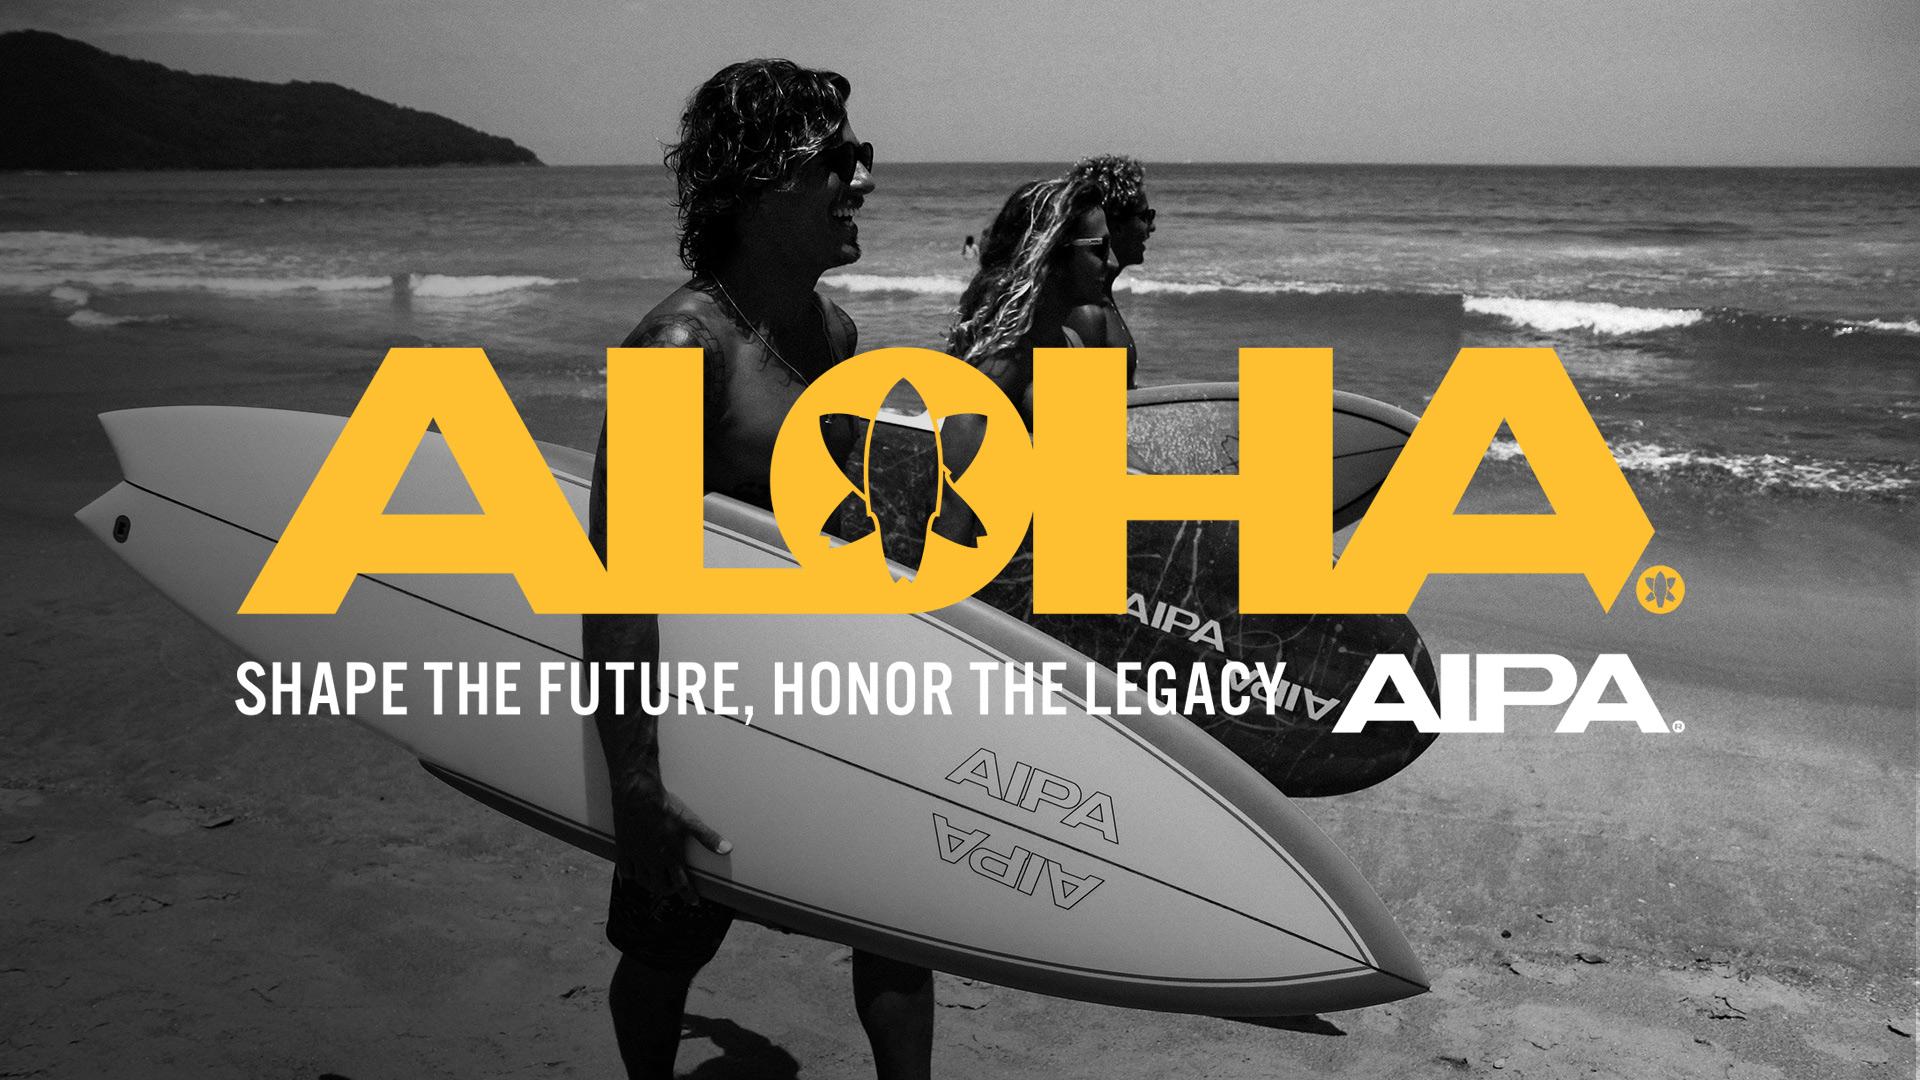 Aipa Surf Aloha Hawaii - Unsung Studio Branding